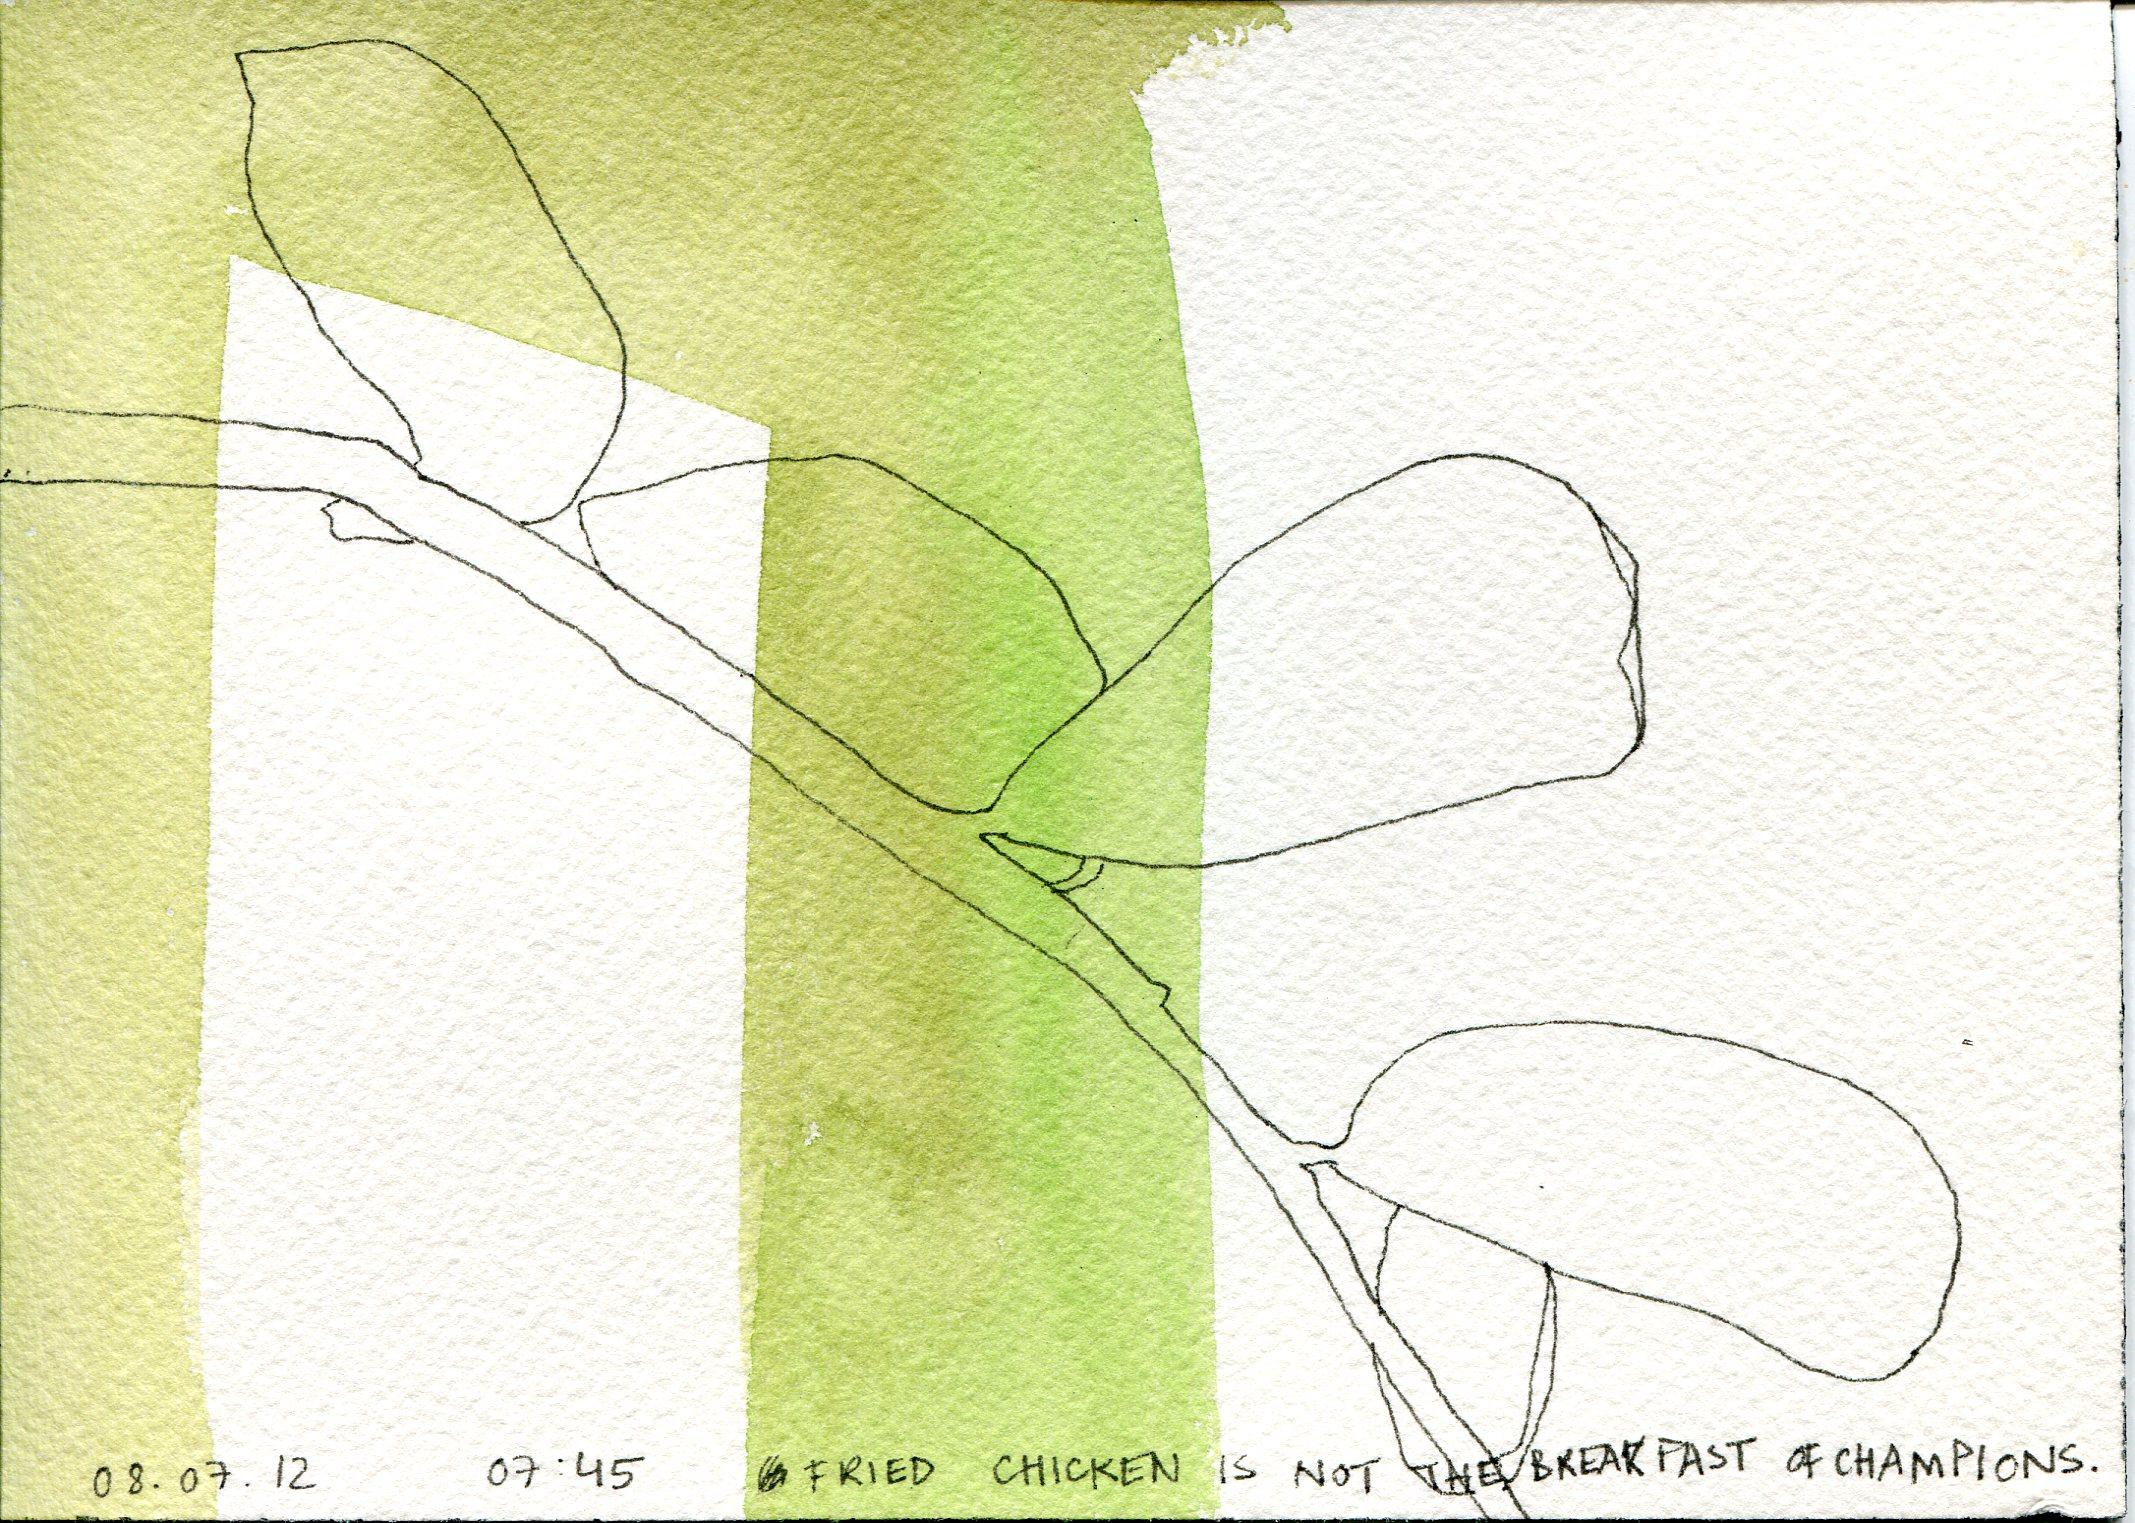 2012-08-13 drawing001.jpg